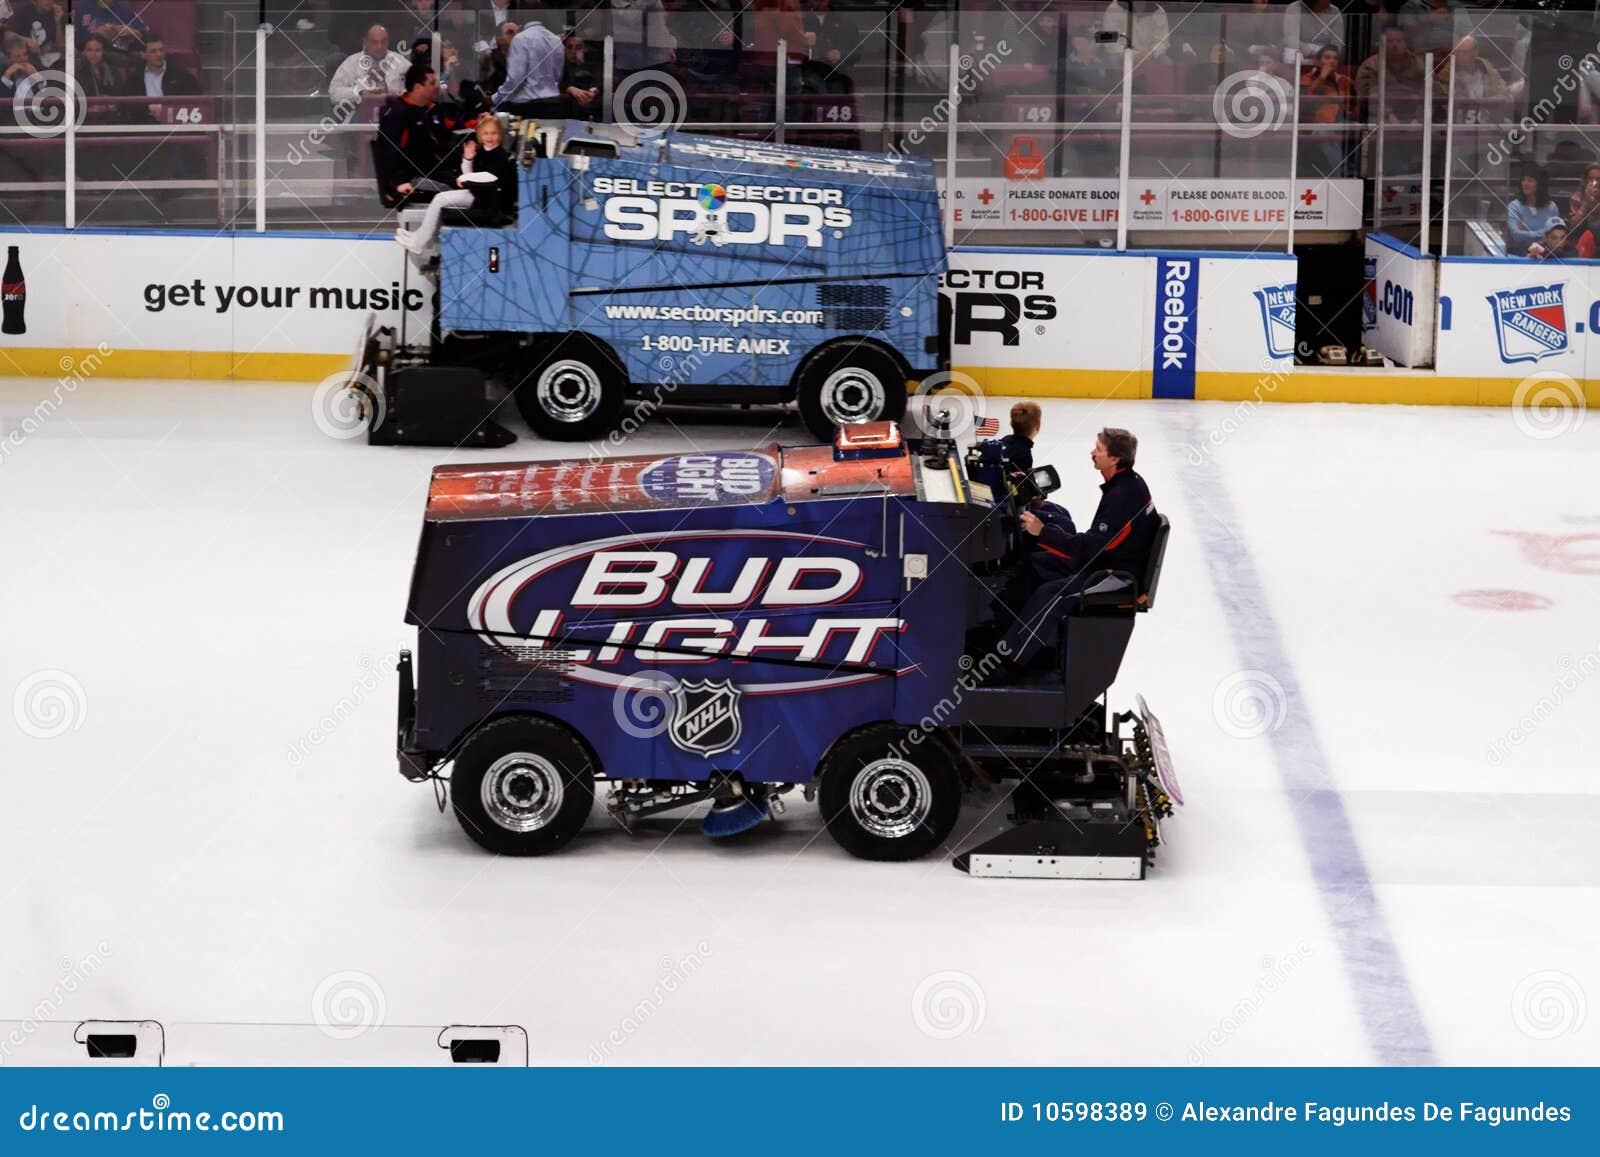 Zamboni in Ice Hockey Game